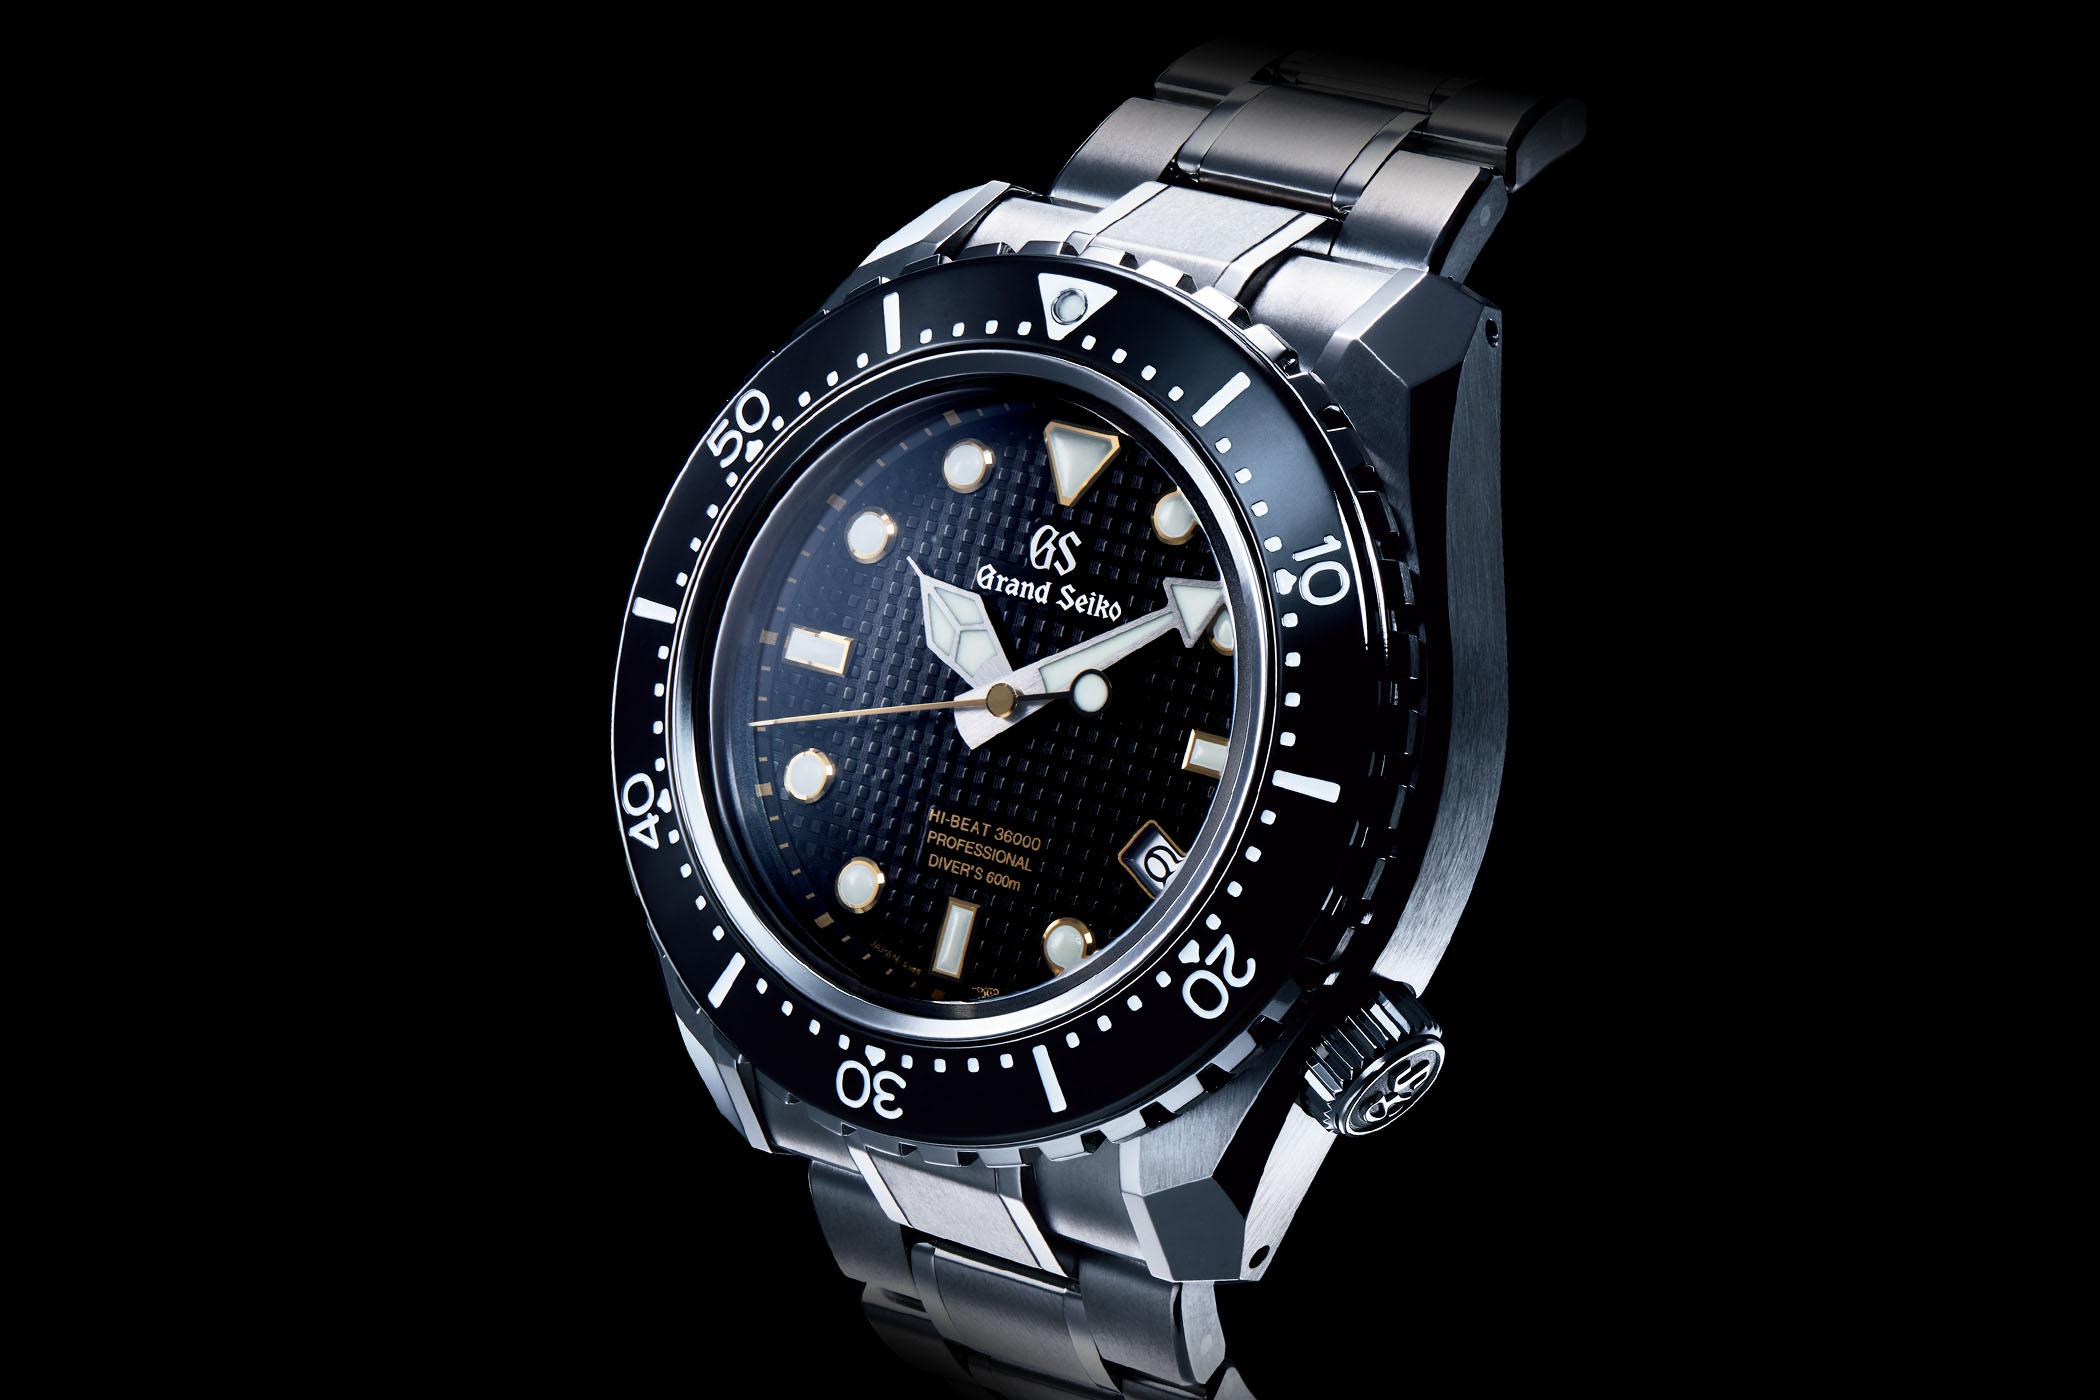 ... Baselworld 2017 – Grand Seiko Hi-Beat 36000 Professional 600m Diver s  (S.. 71b554d65